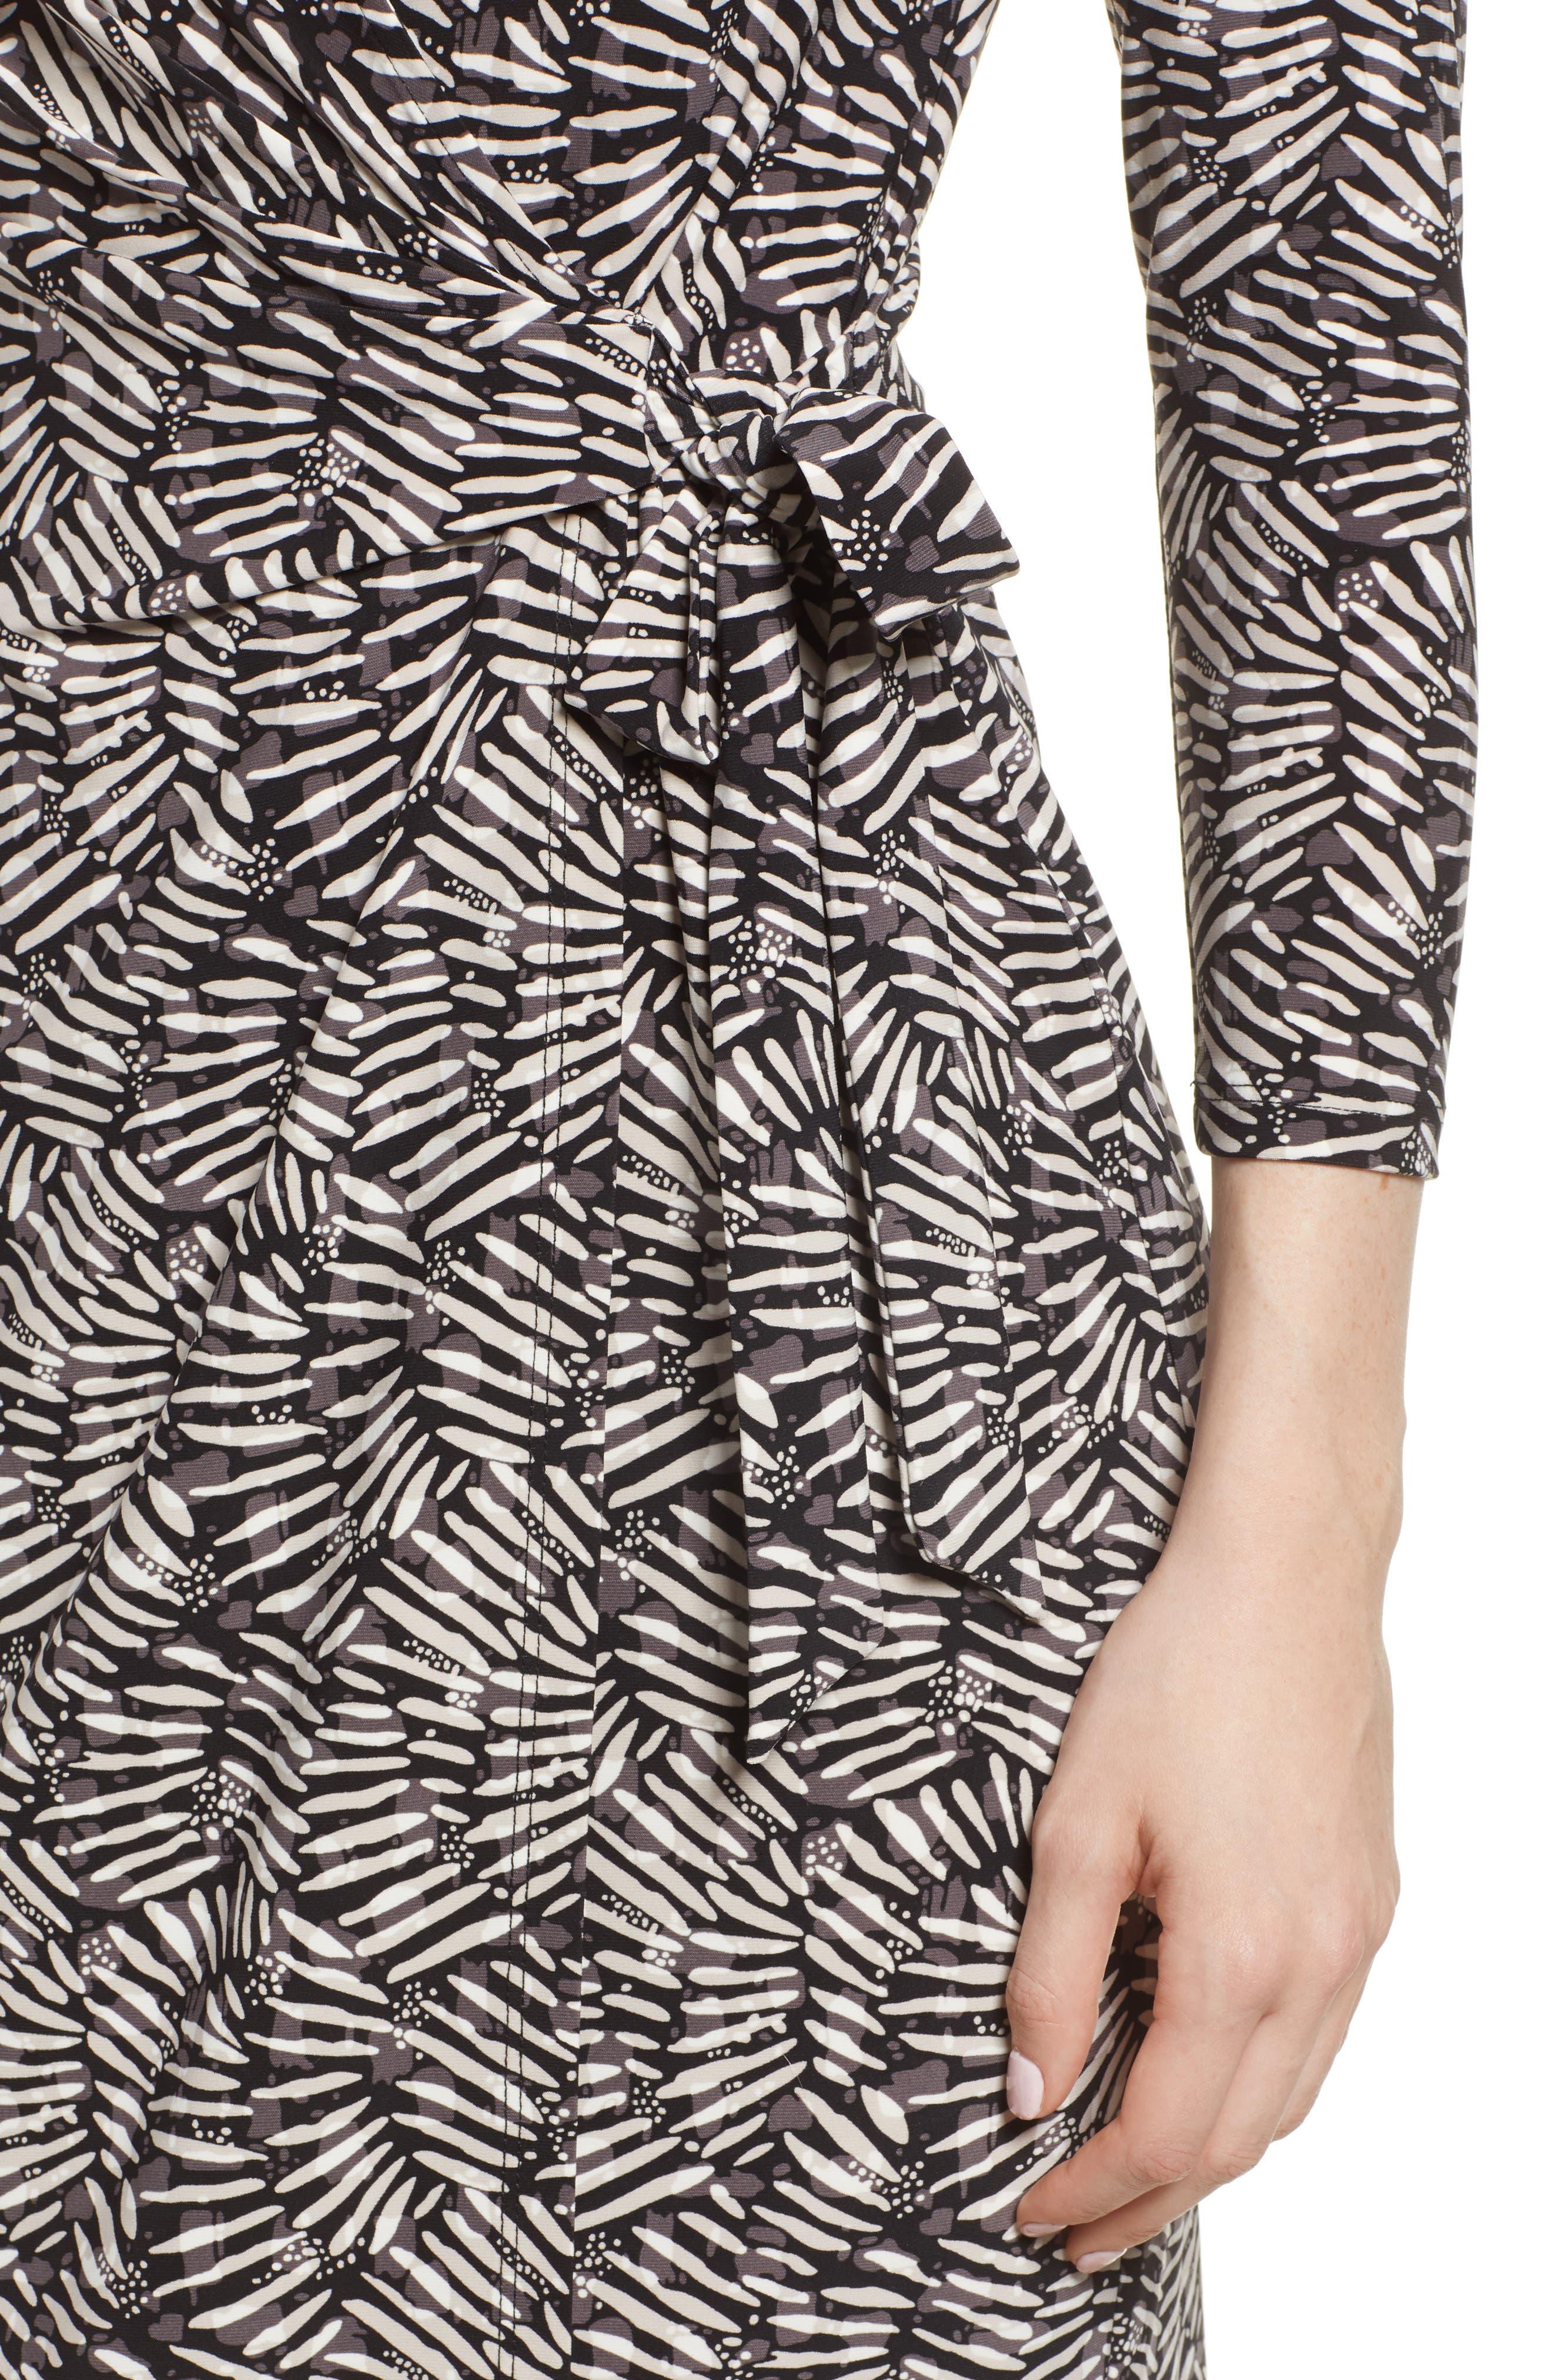 Cedarwood Stretch Crepe Faux Wrap Dress,                             Alternate thumbnail 4, color,                             Black/ Oyster Shell Combo